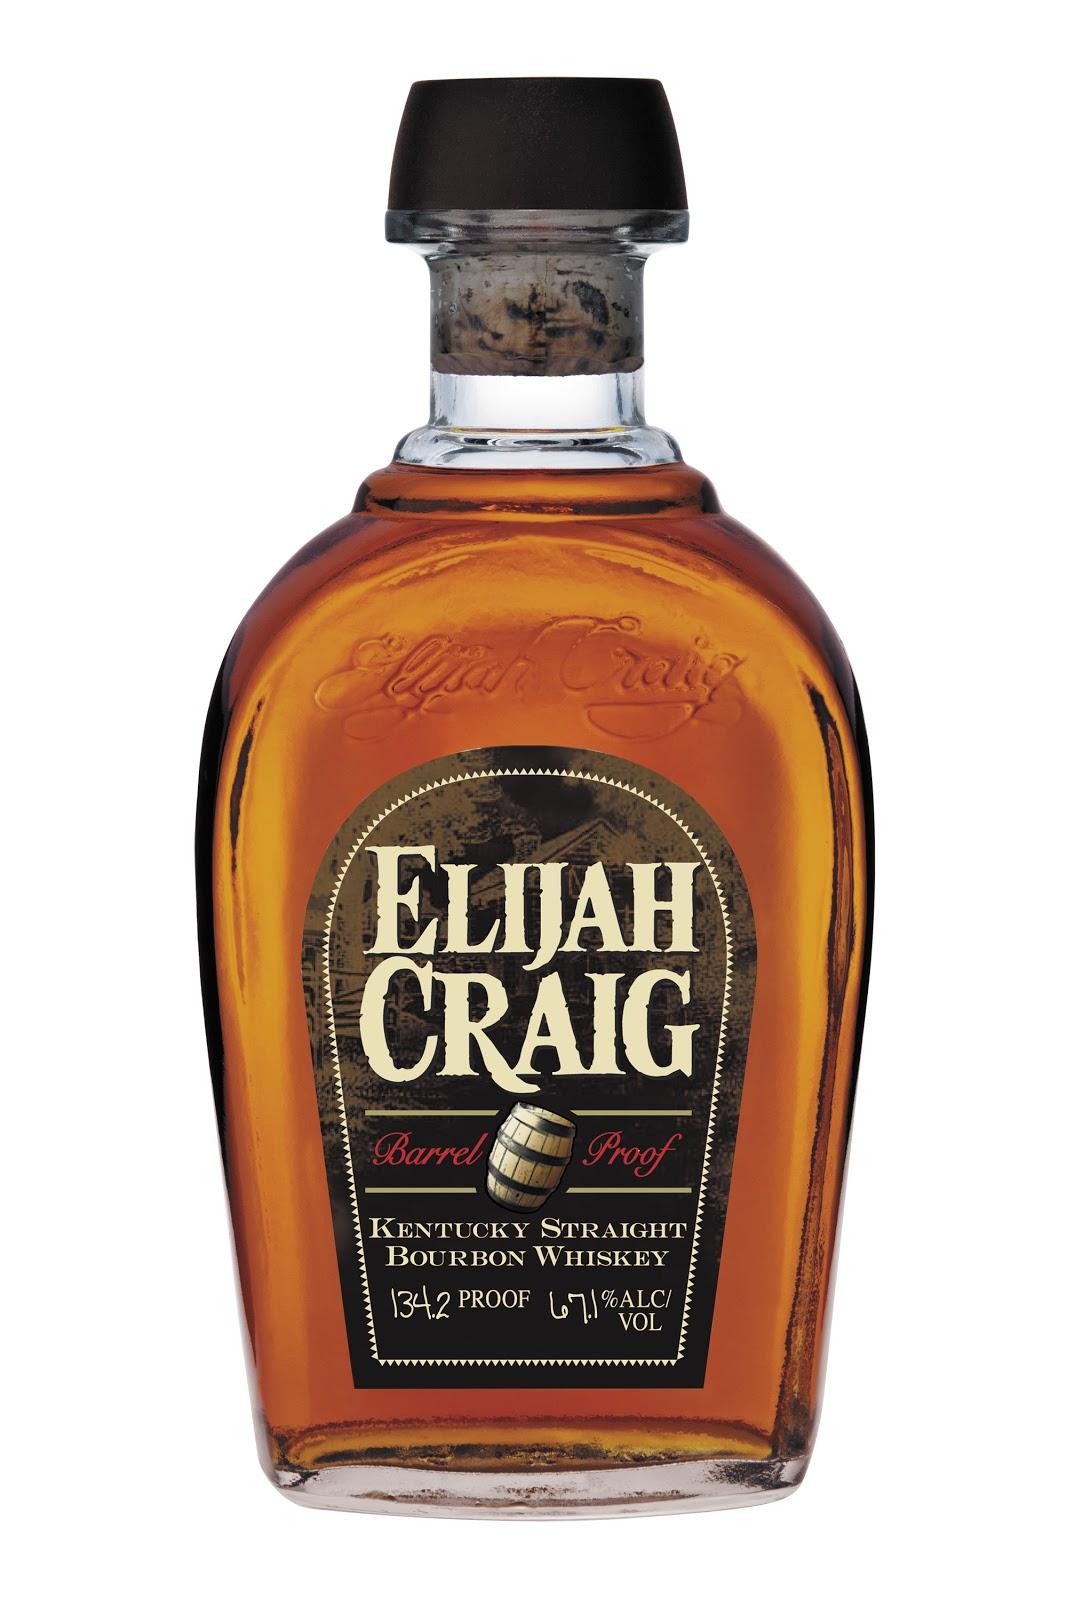 5488f8ecc7d The Chuck Cowdery Blog  New Barrel Proof Elijah Craig 12-Year-Old